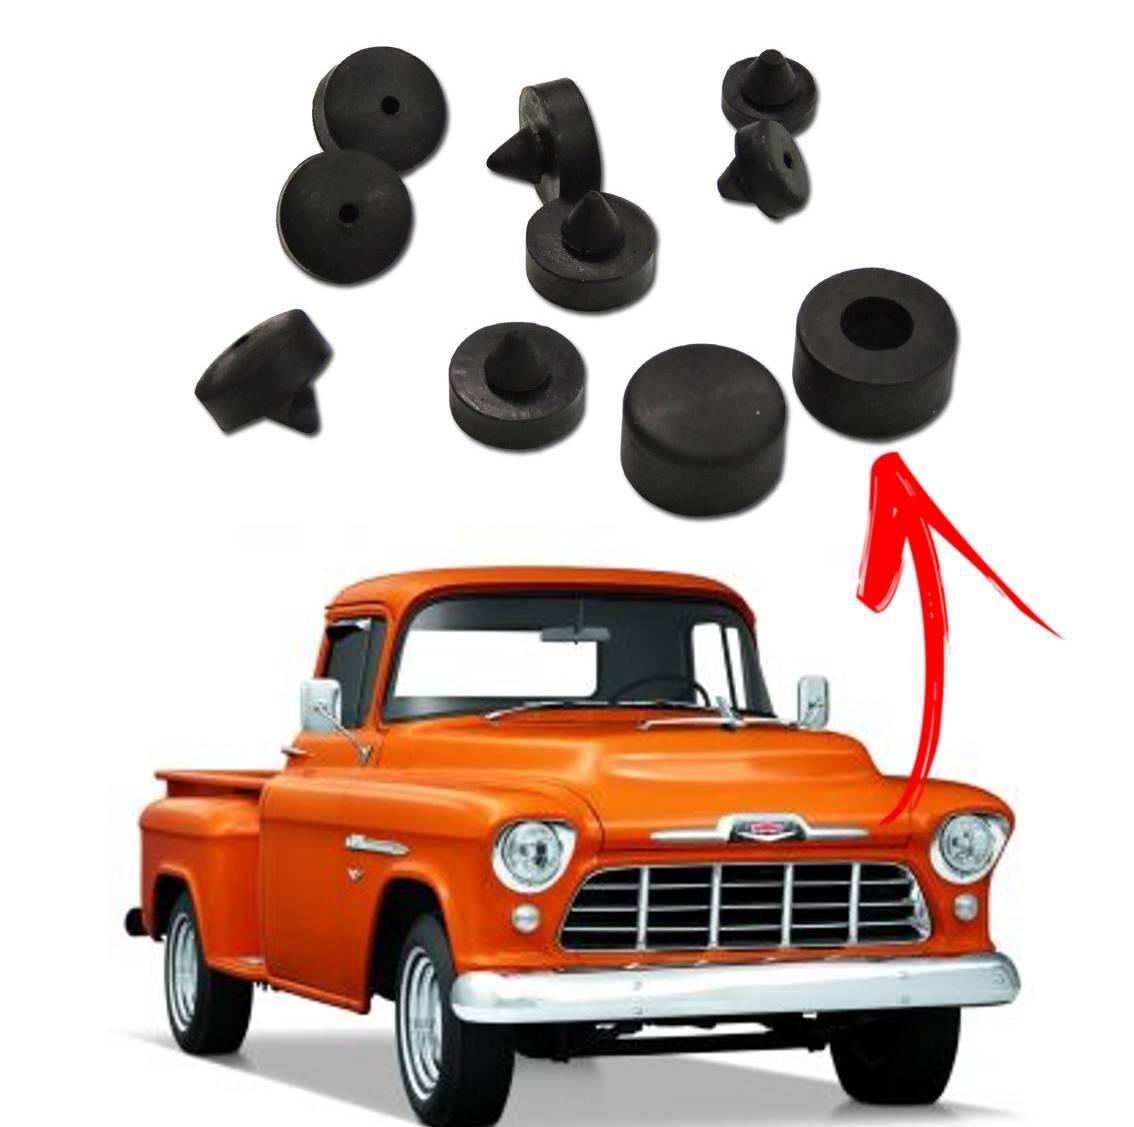 Kit Borrachas Batentes do Capô para pickup Chevrolet 1955 a 1959